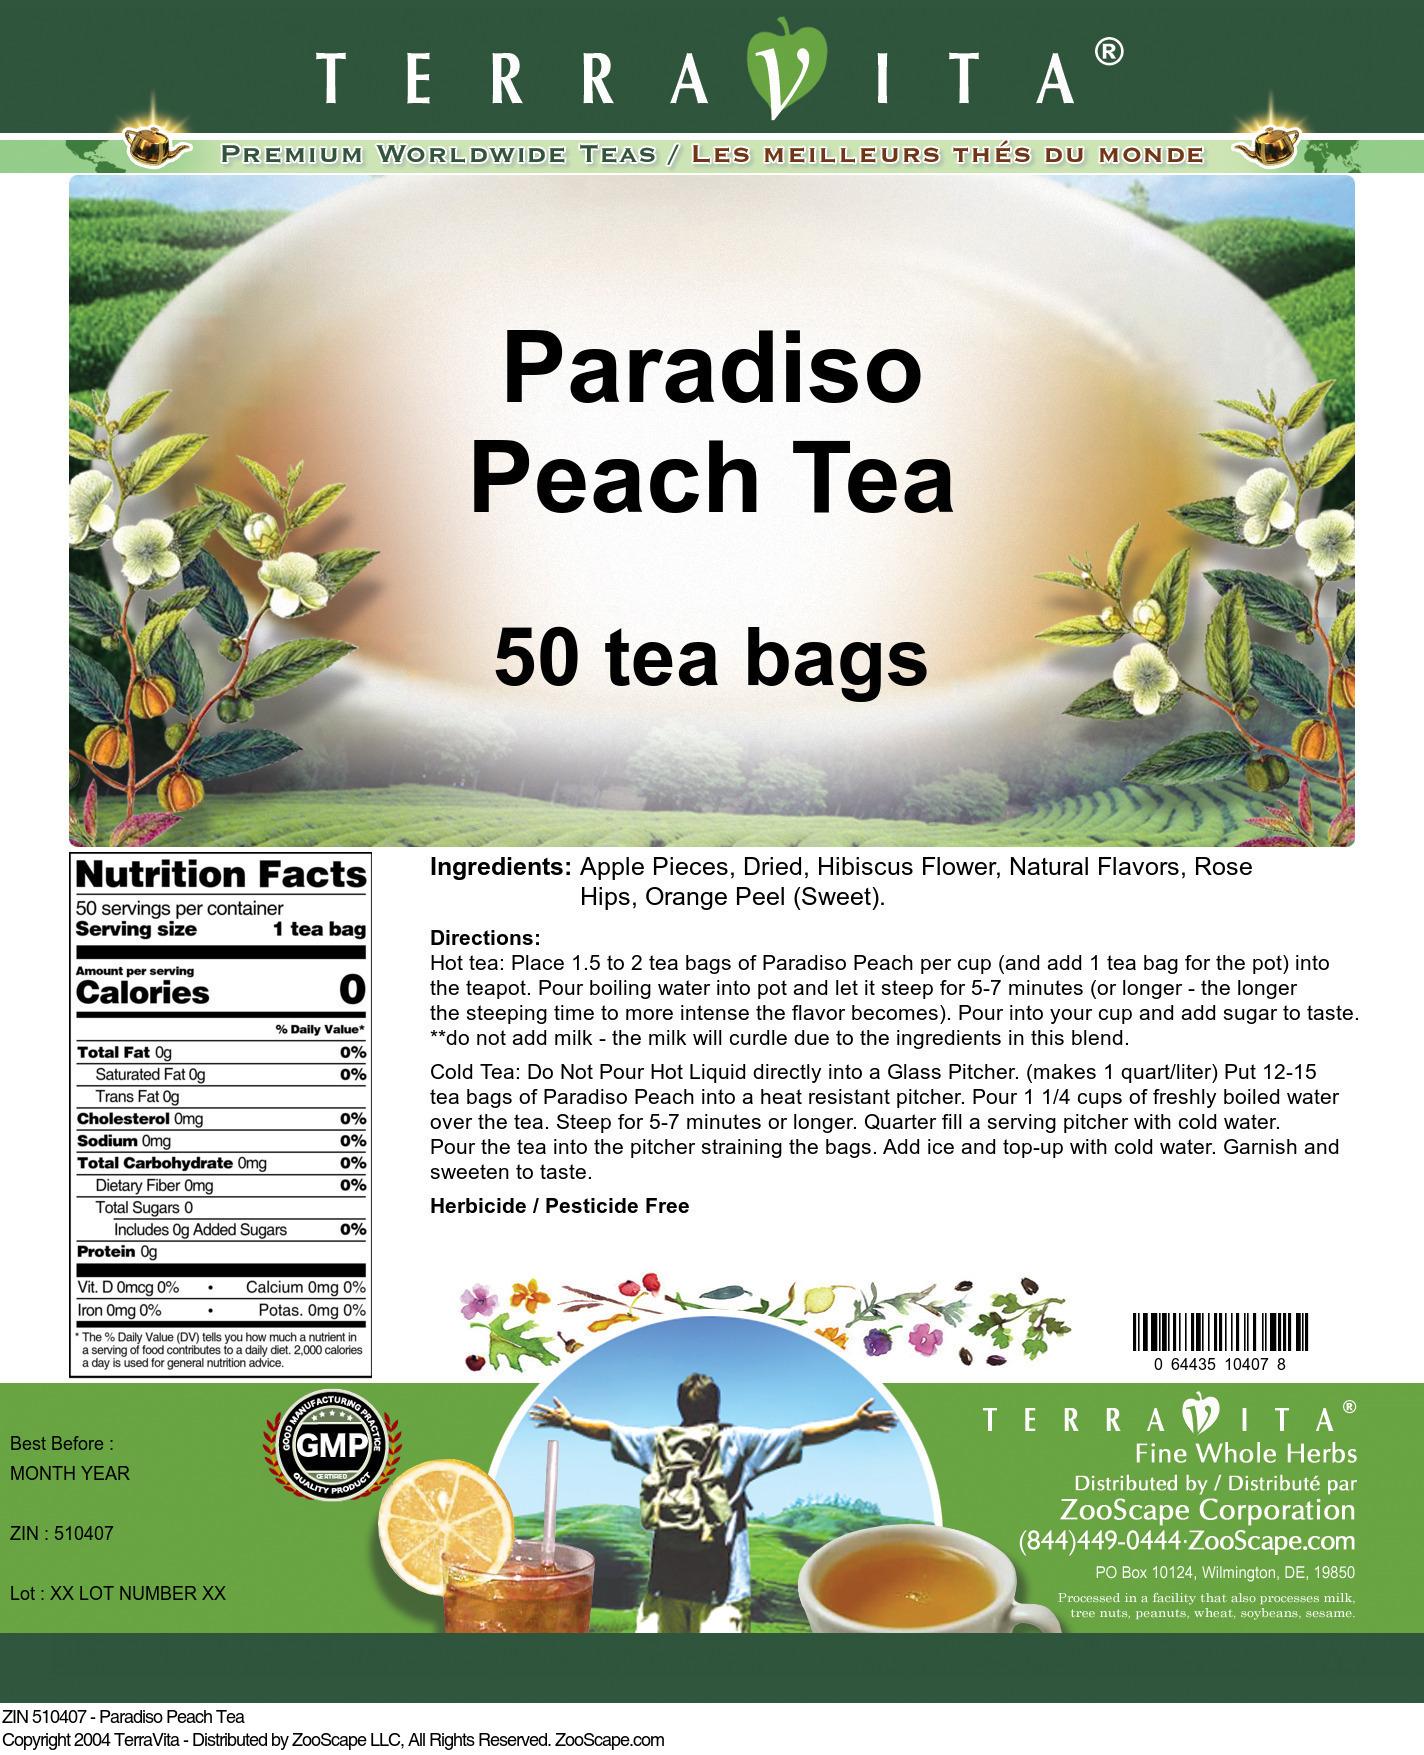 Paradiso Peach Tea